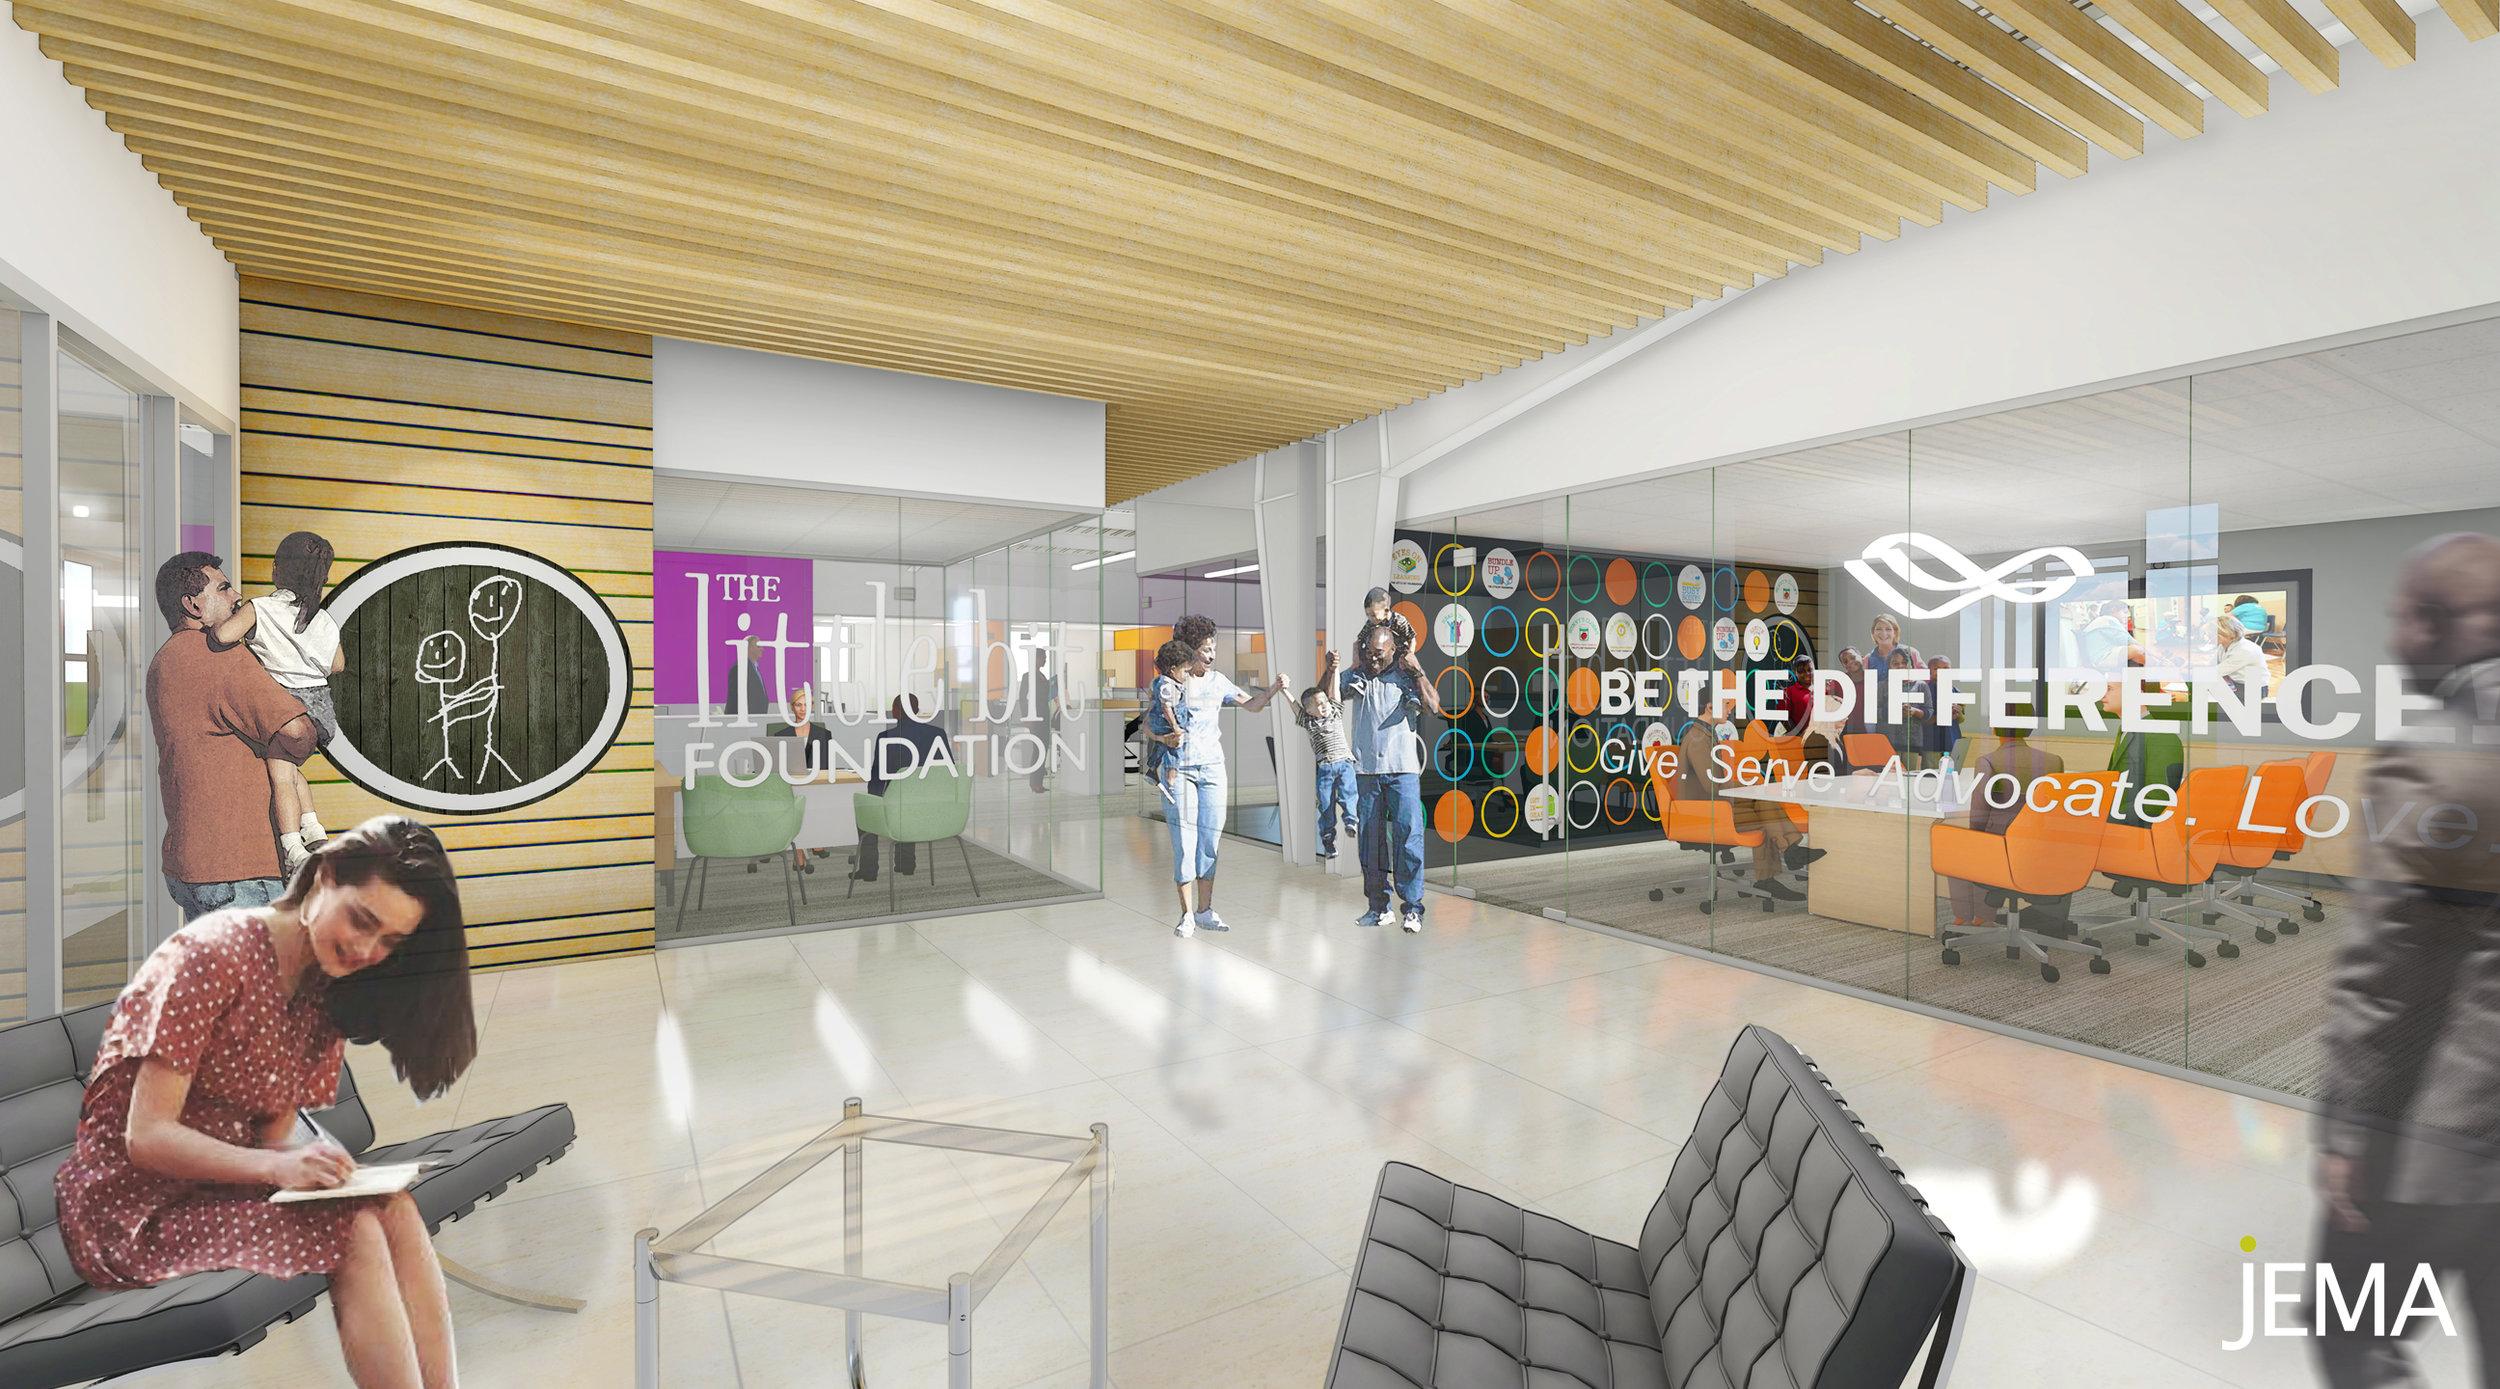 The Little Bit Foundation's new HQ -